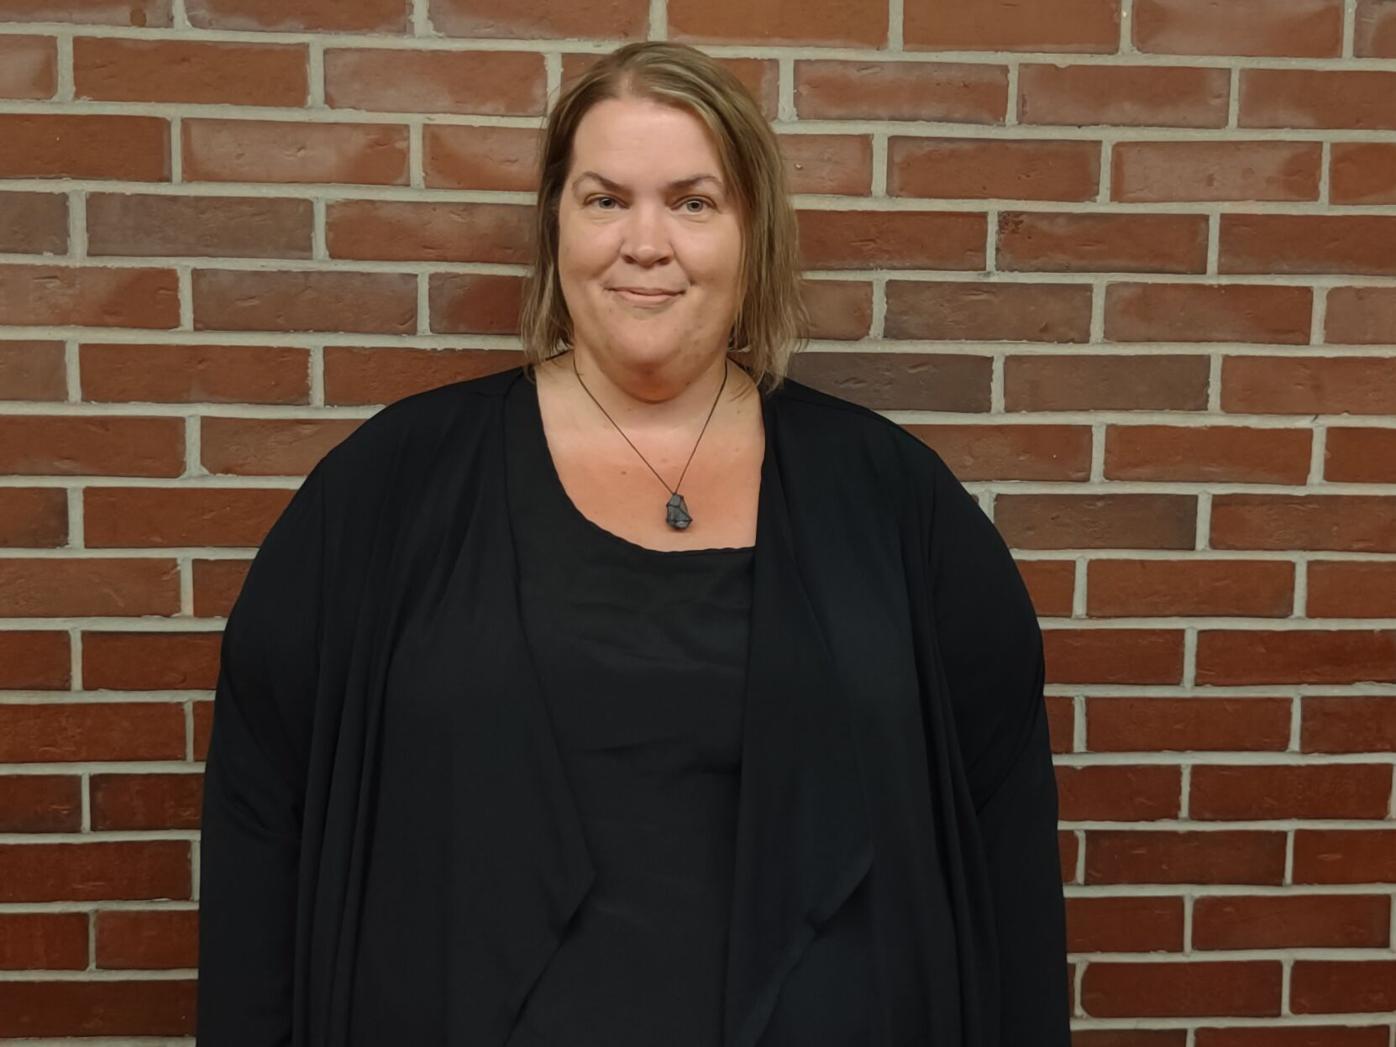 Ashfield Town Administrator Jennifer Morse